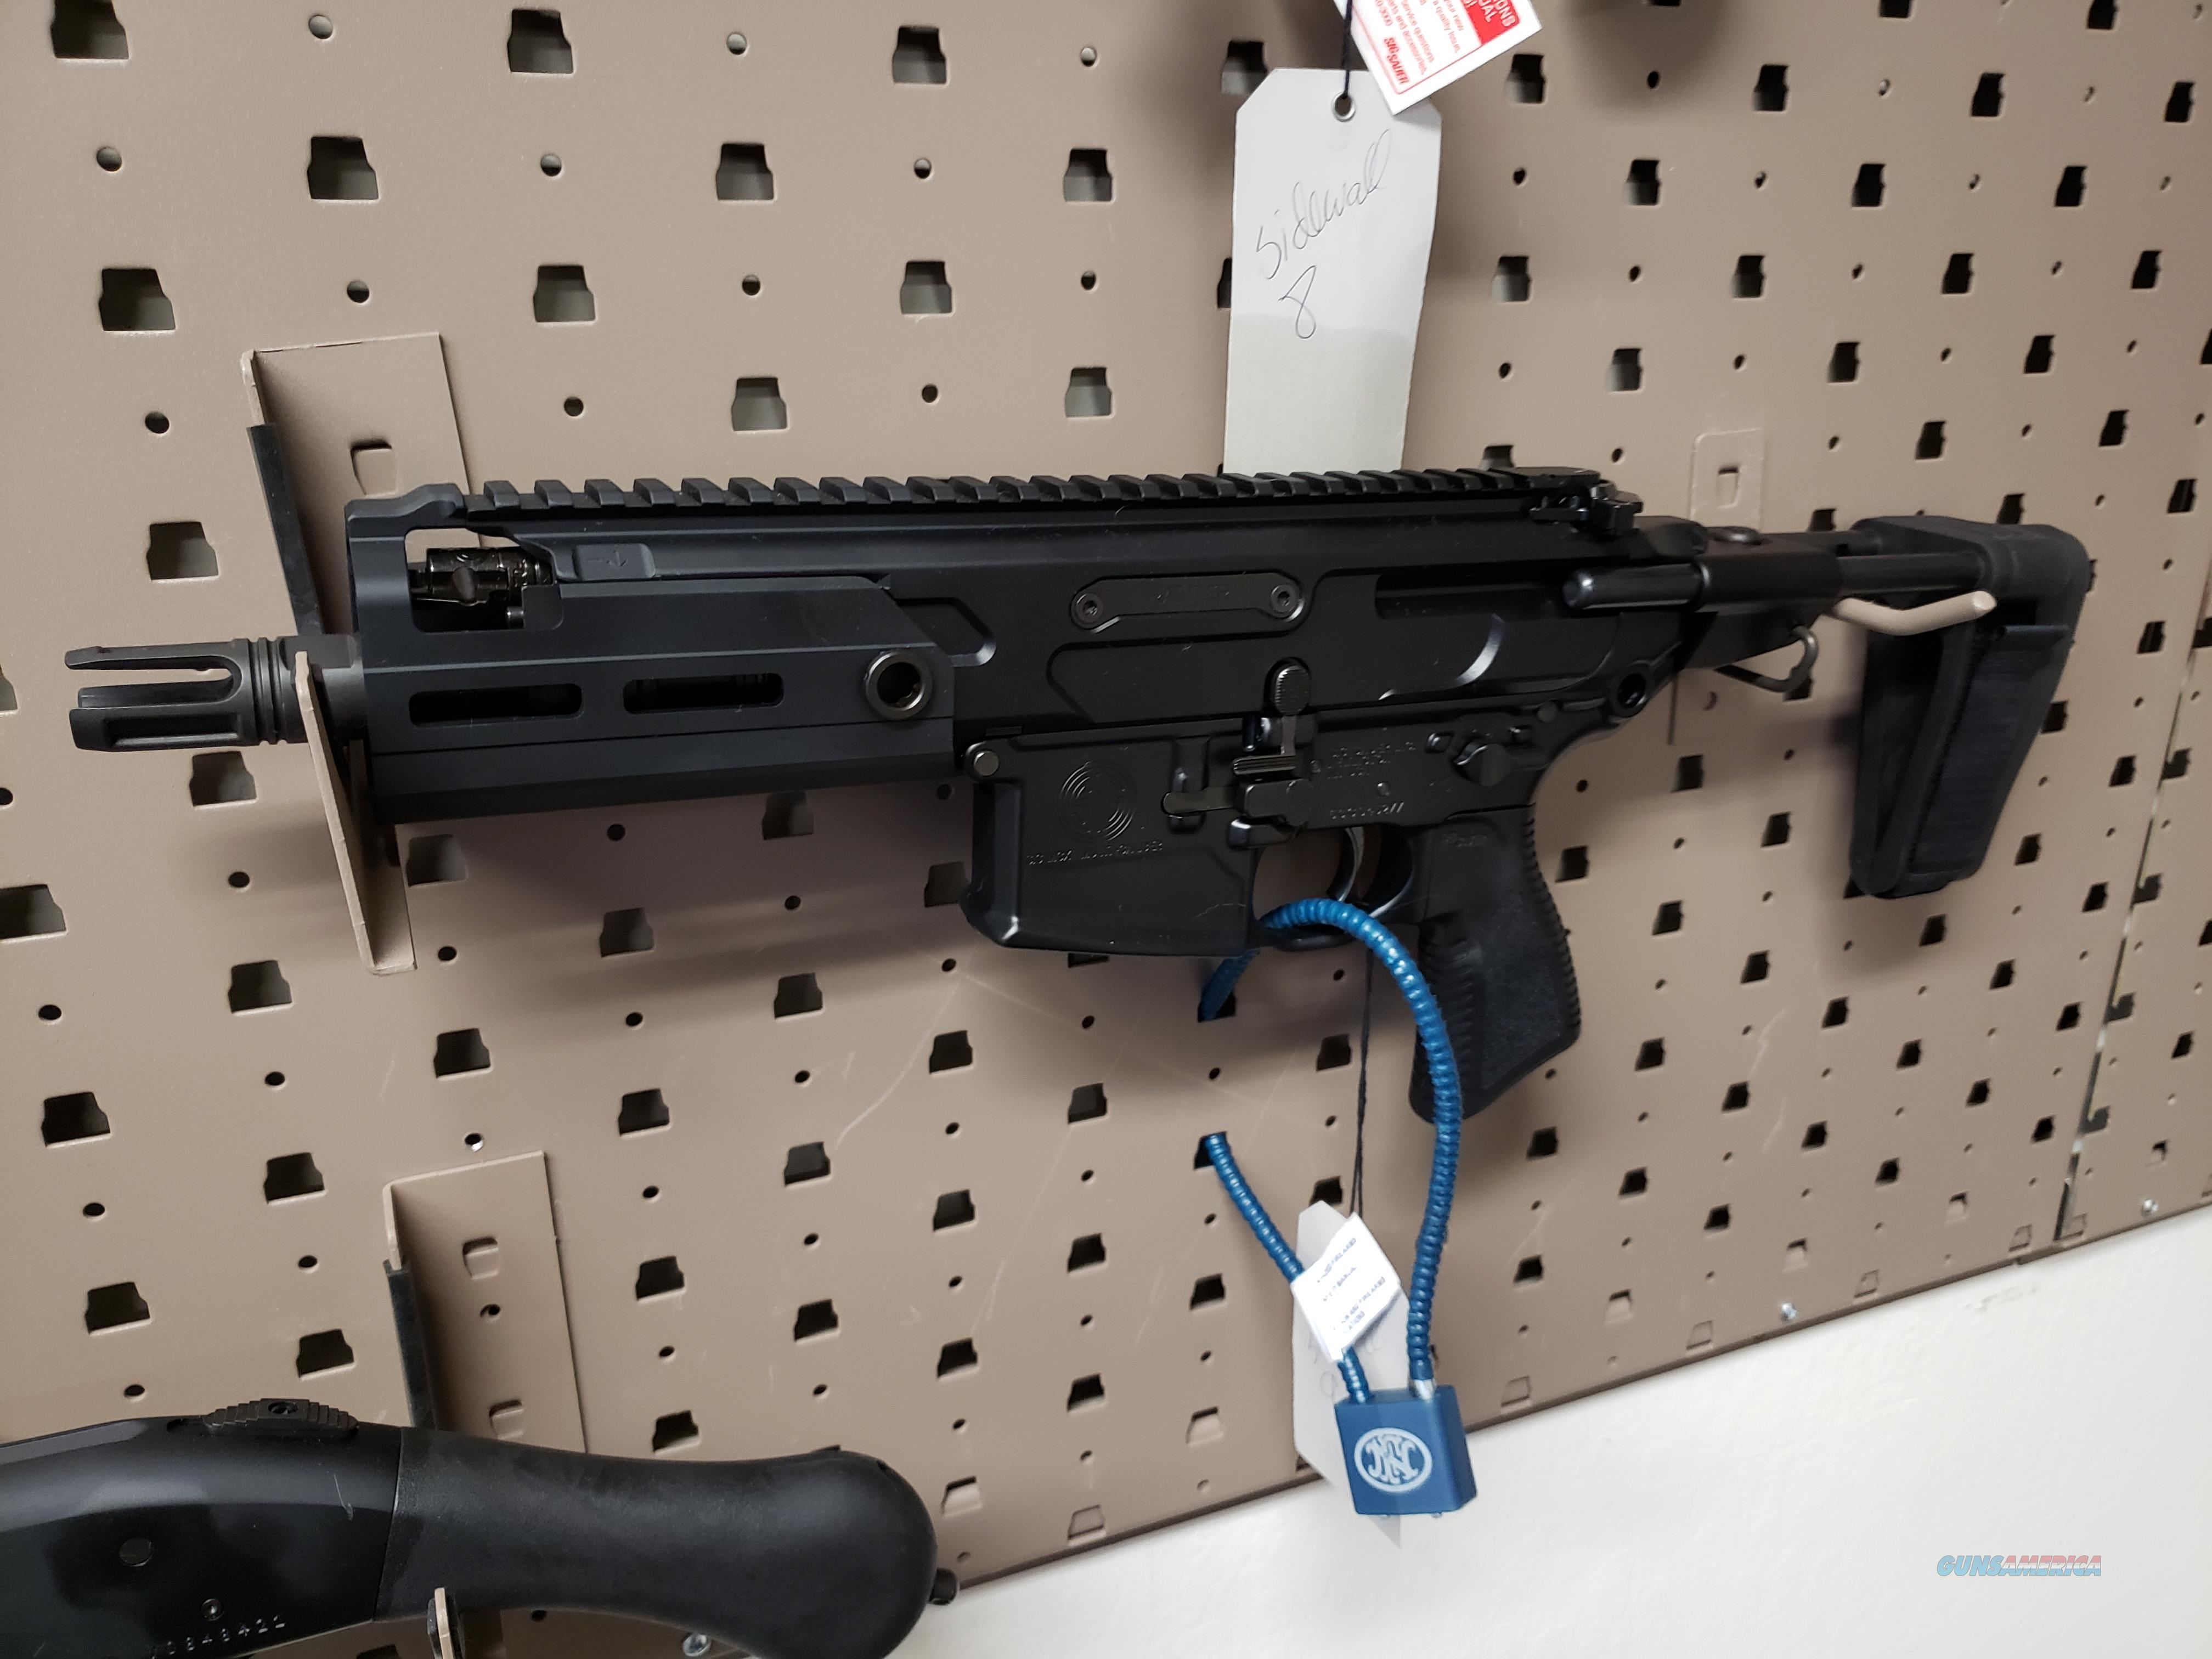 SIG MCX RATTLER 300BLK 5.5? BLK 30RD  Guns > Pistols > Sig - Sauer/Sigarms Pistols > MPX / MCX